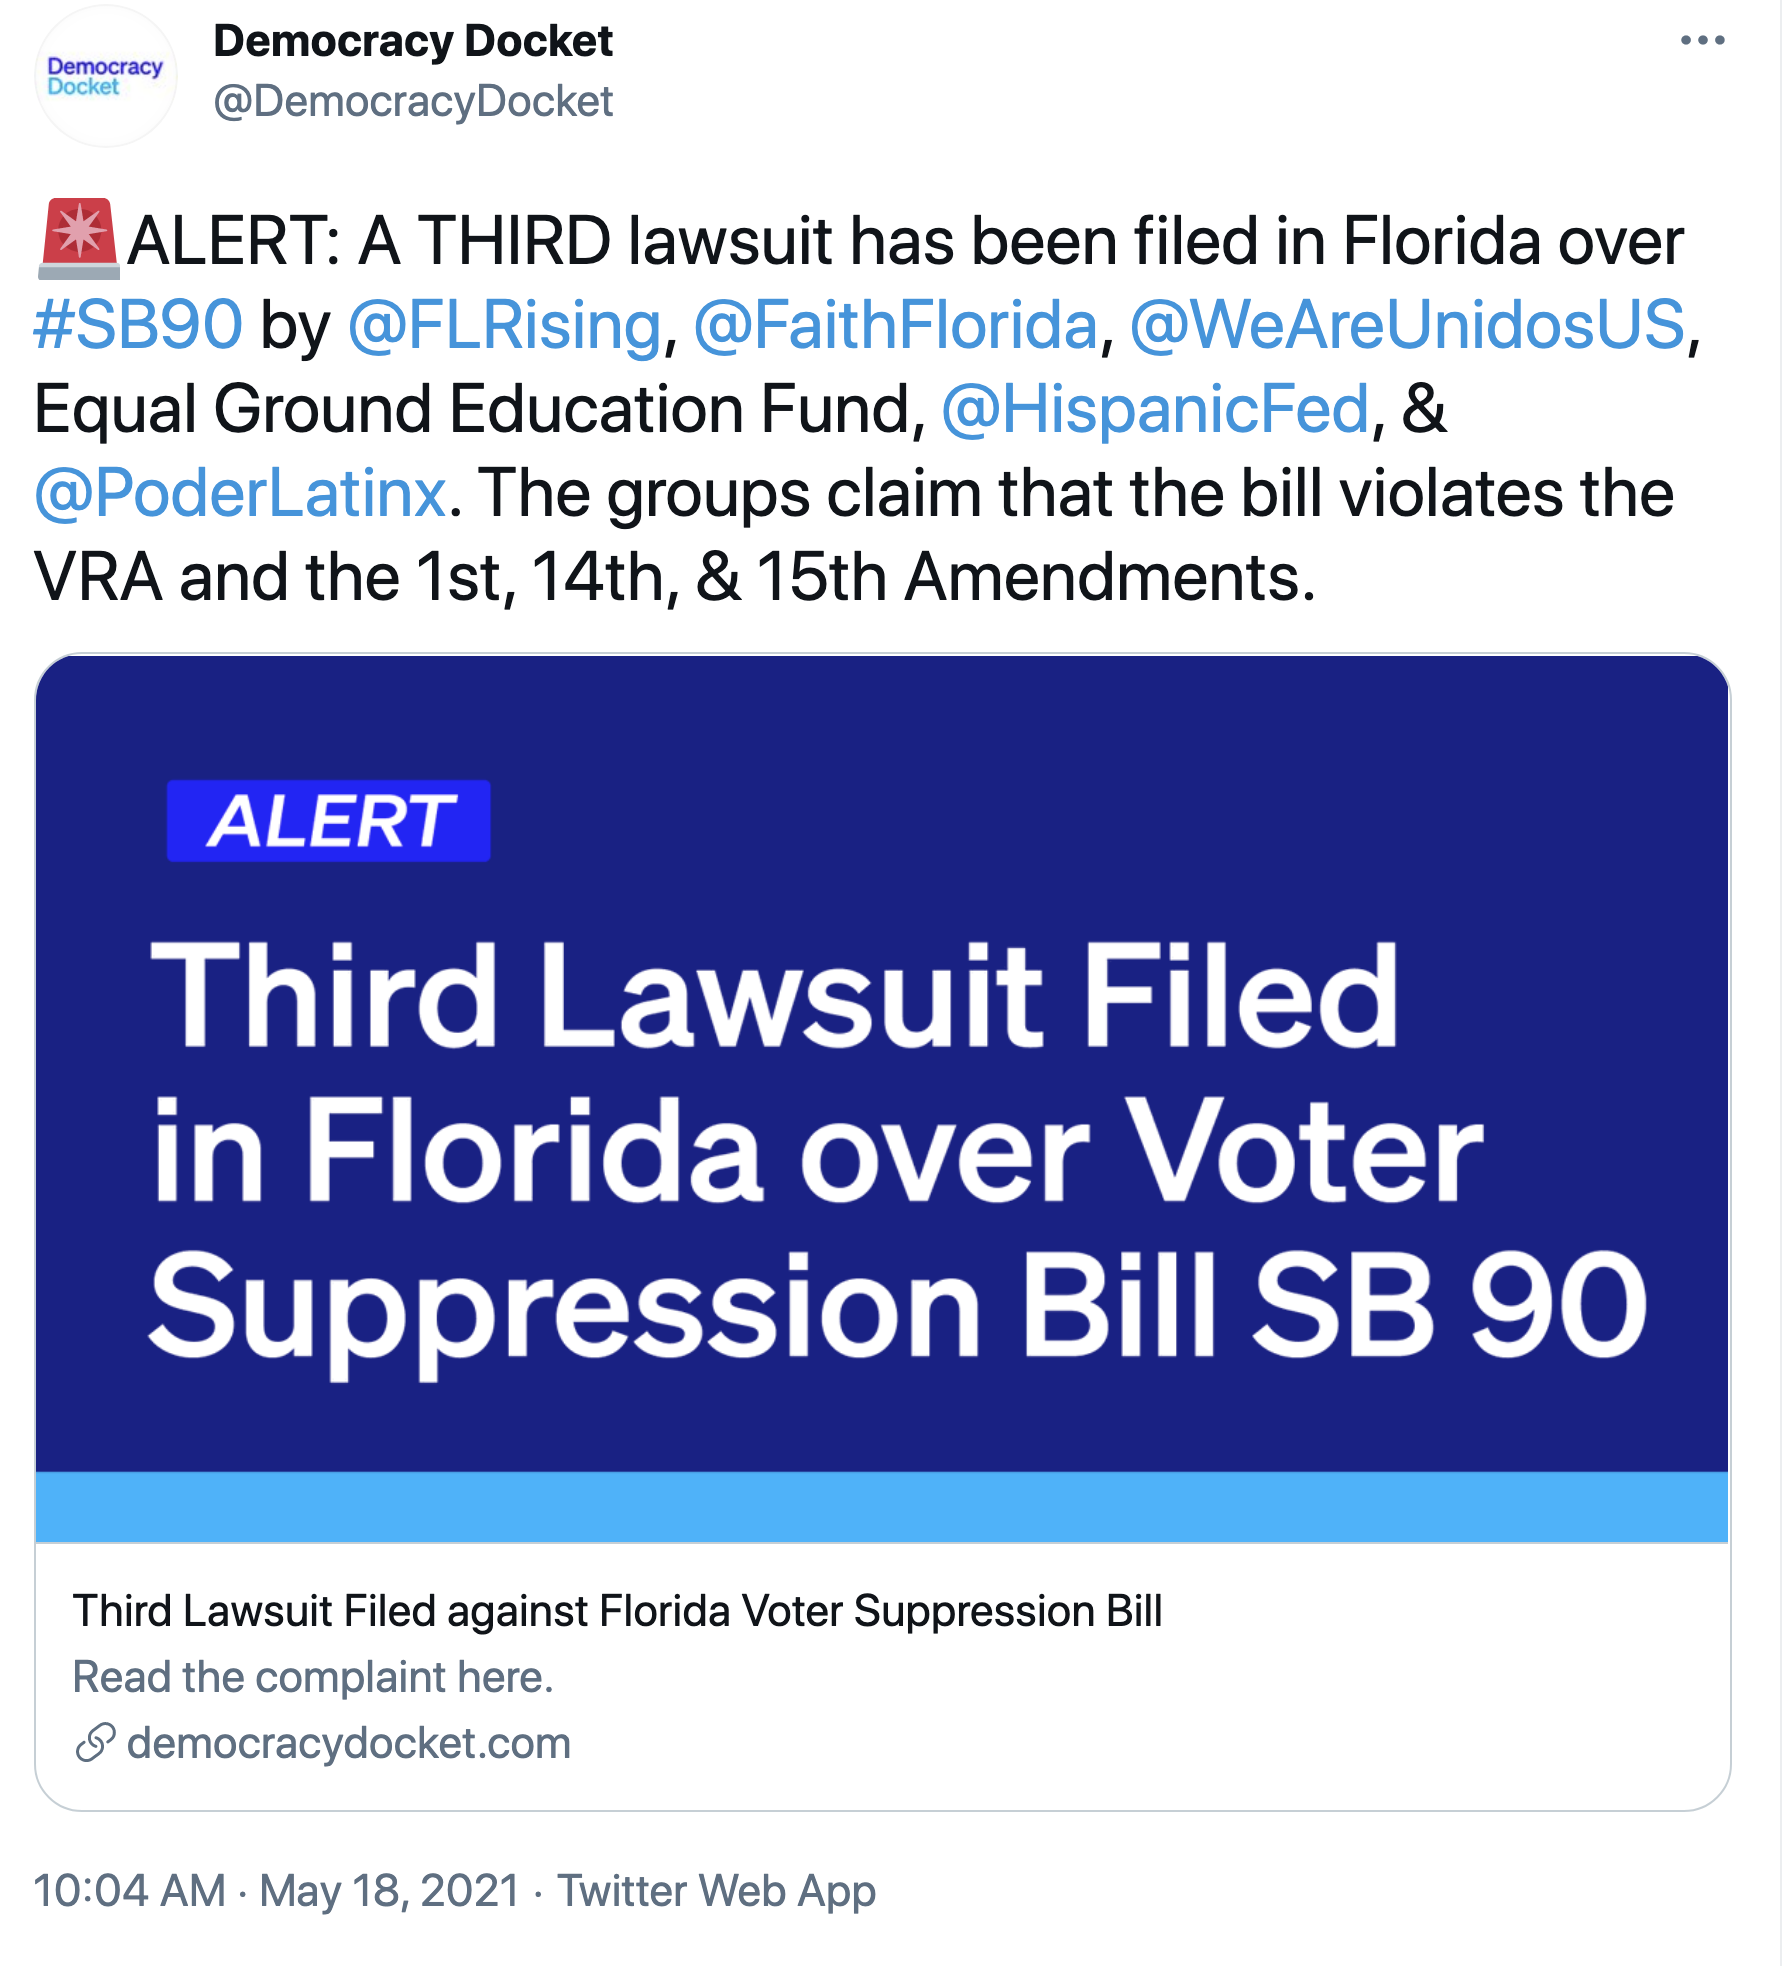 Screen-Shot-2021-05-18-at-10.16.45-AM Ron DeSantis Hit By Major Lawsuit To Kill Voter Suppression Bill Activism Corruption Crime Politics Top Stories